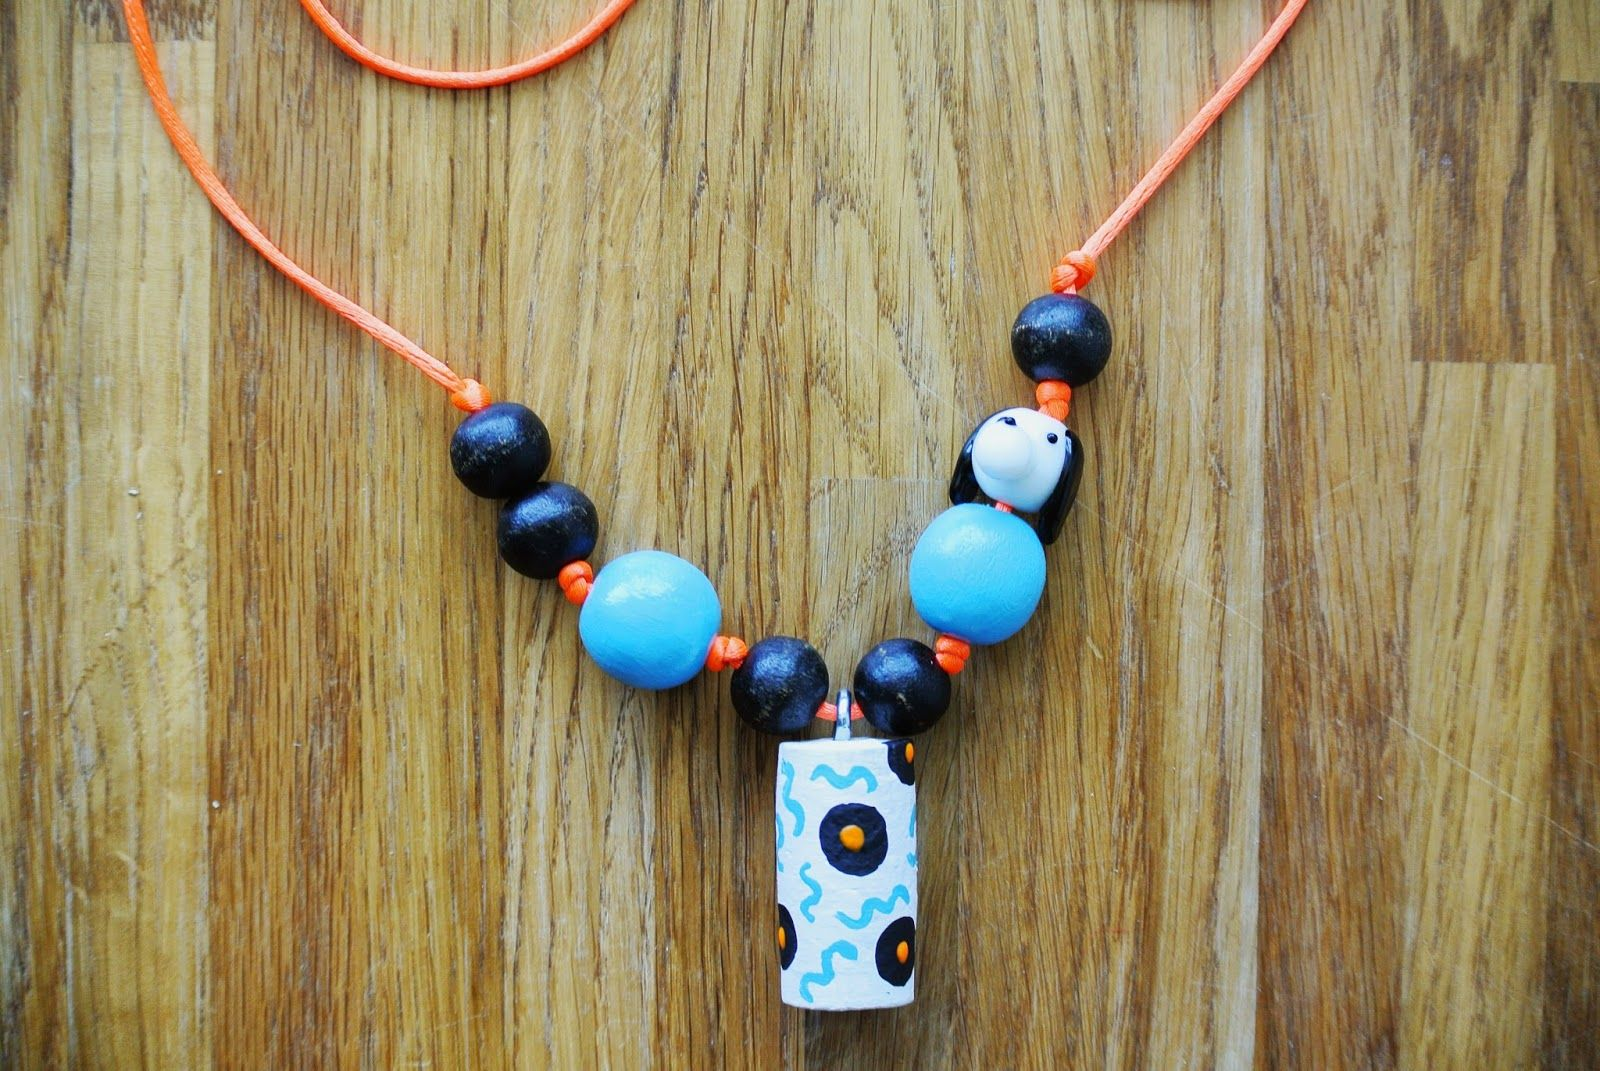 DIY kid necklace simple project kids activity crafts